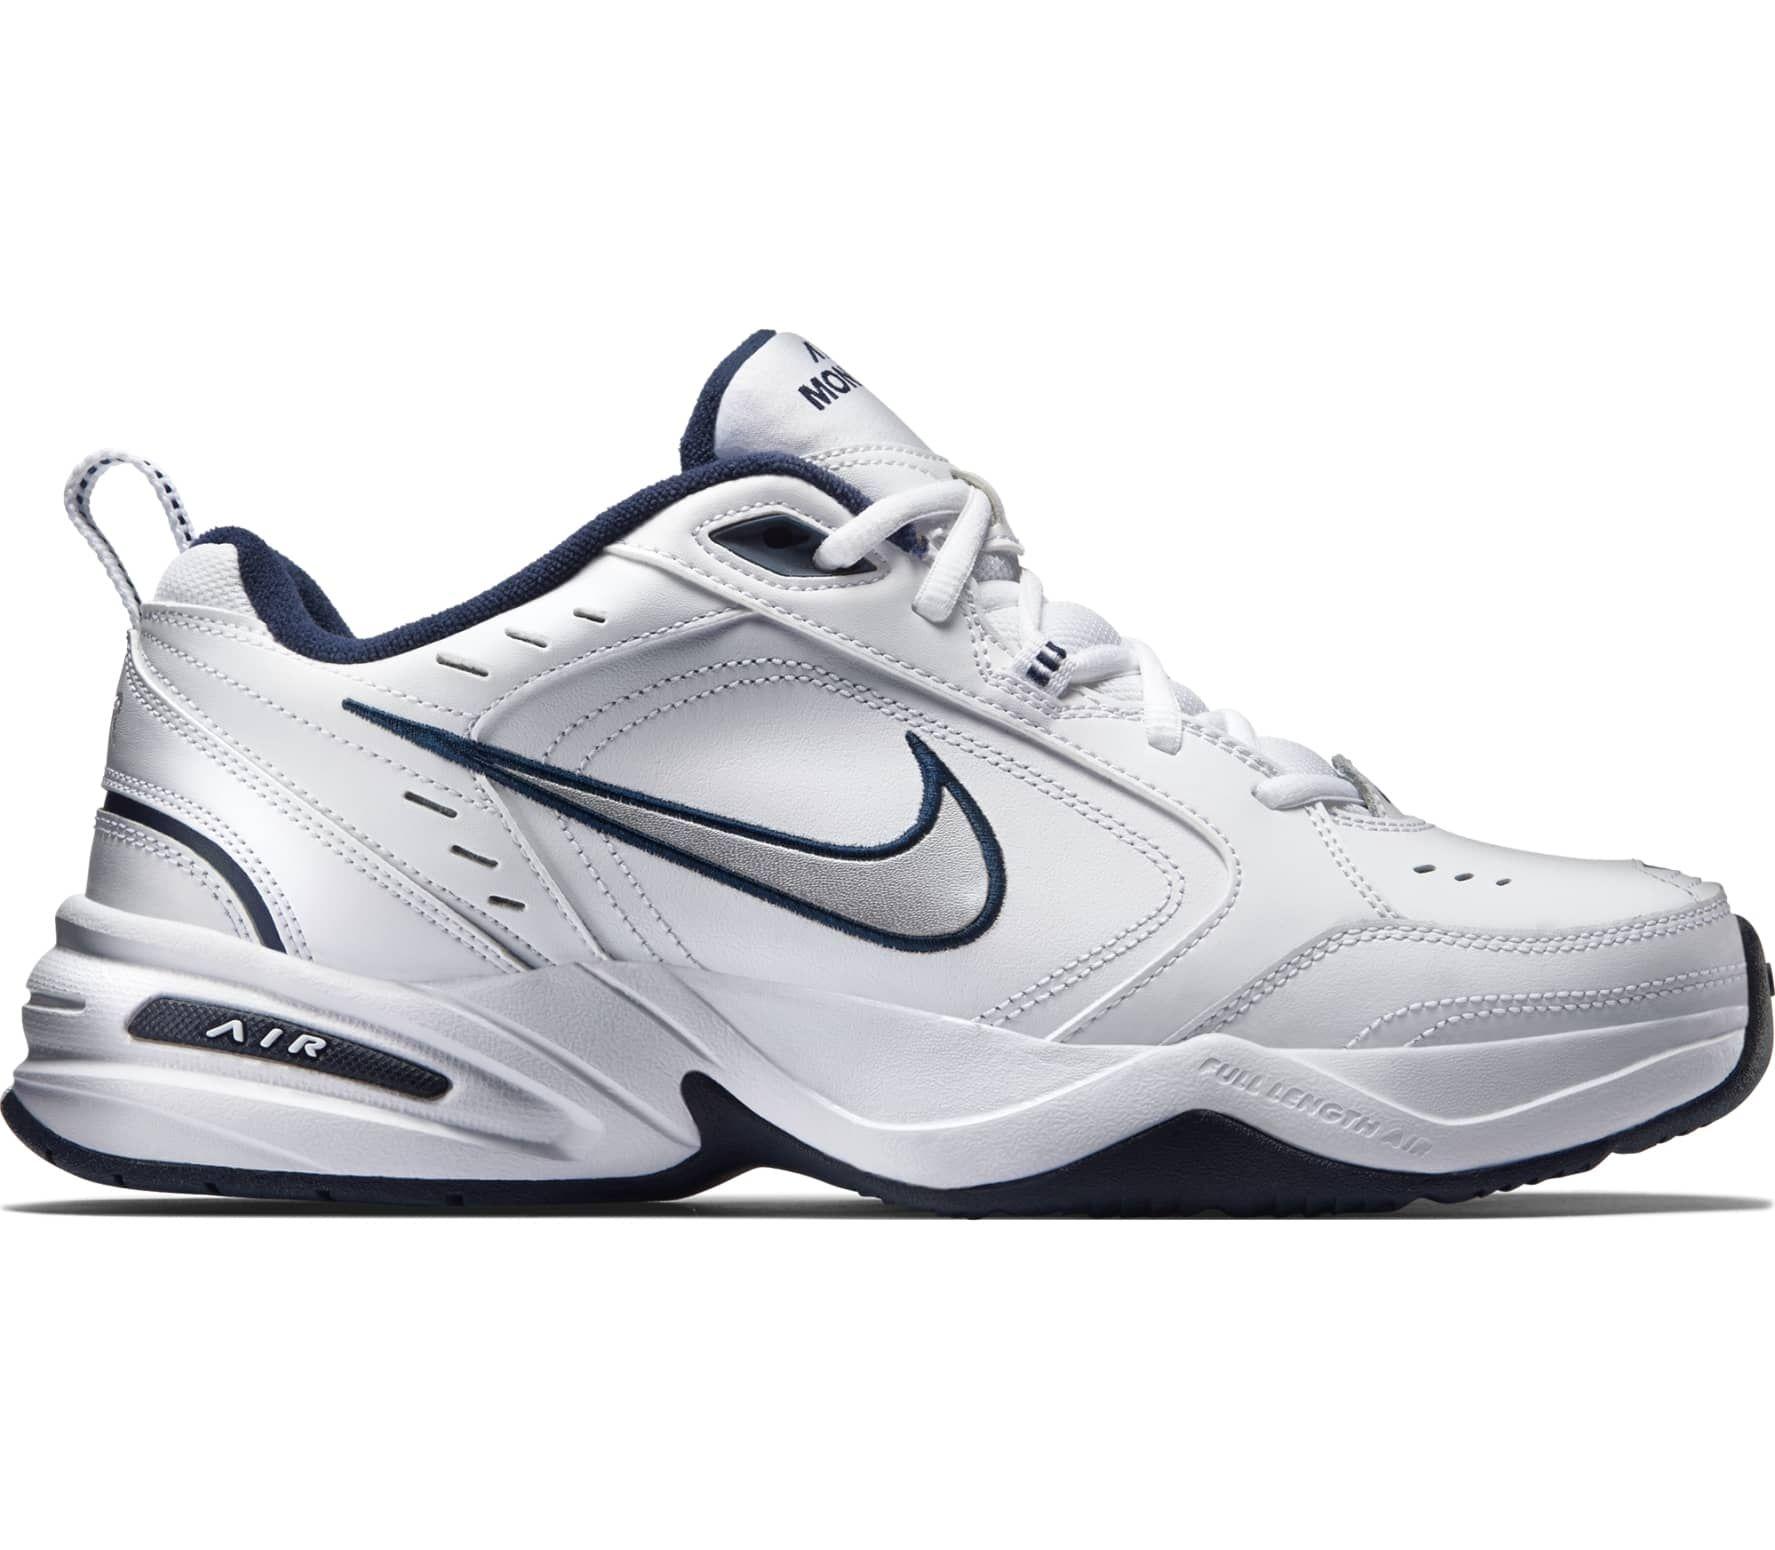 chaussures IV Monarch Air chaussures Sport De chaussures